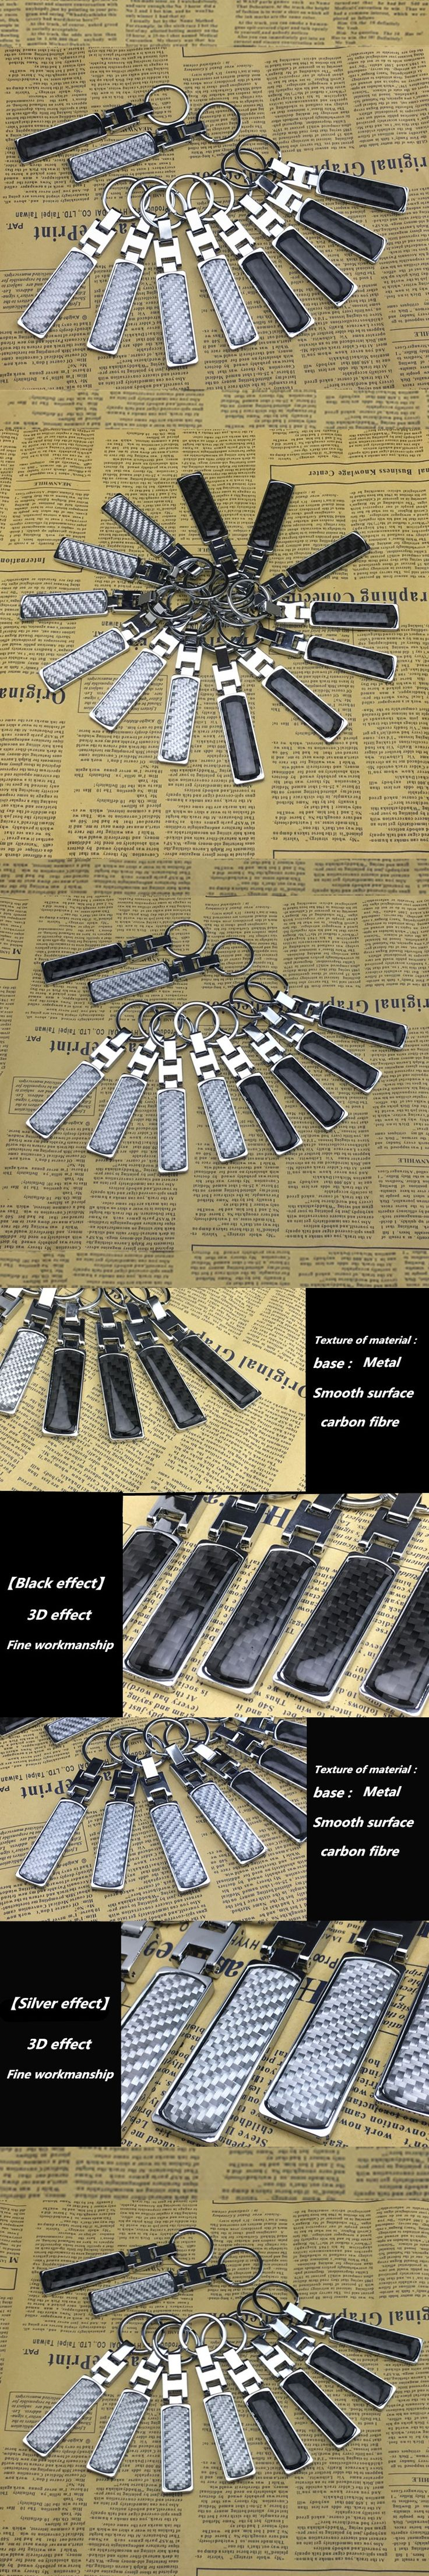 1pcs metal carbon fiber key buckle ring chain for Infiniti FX35 FX37 EX25 G37 G35 G25 Q50 QX50 Car Styling